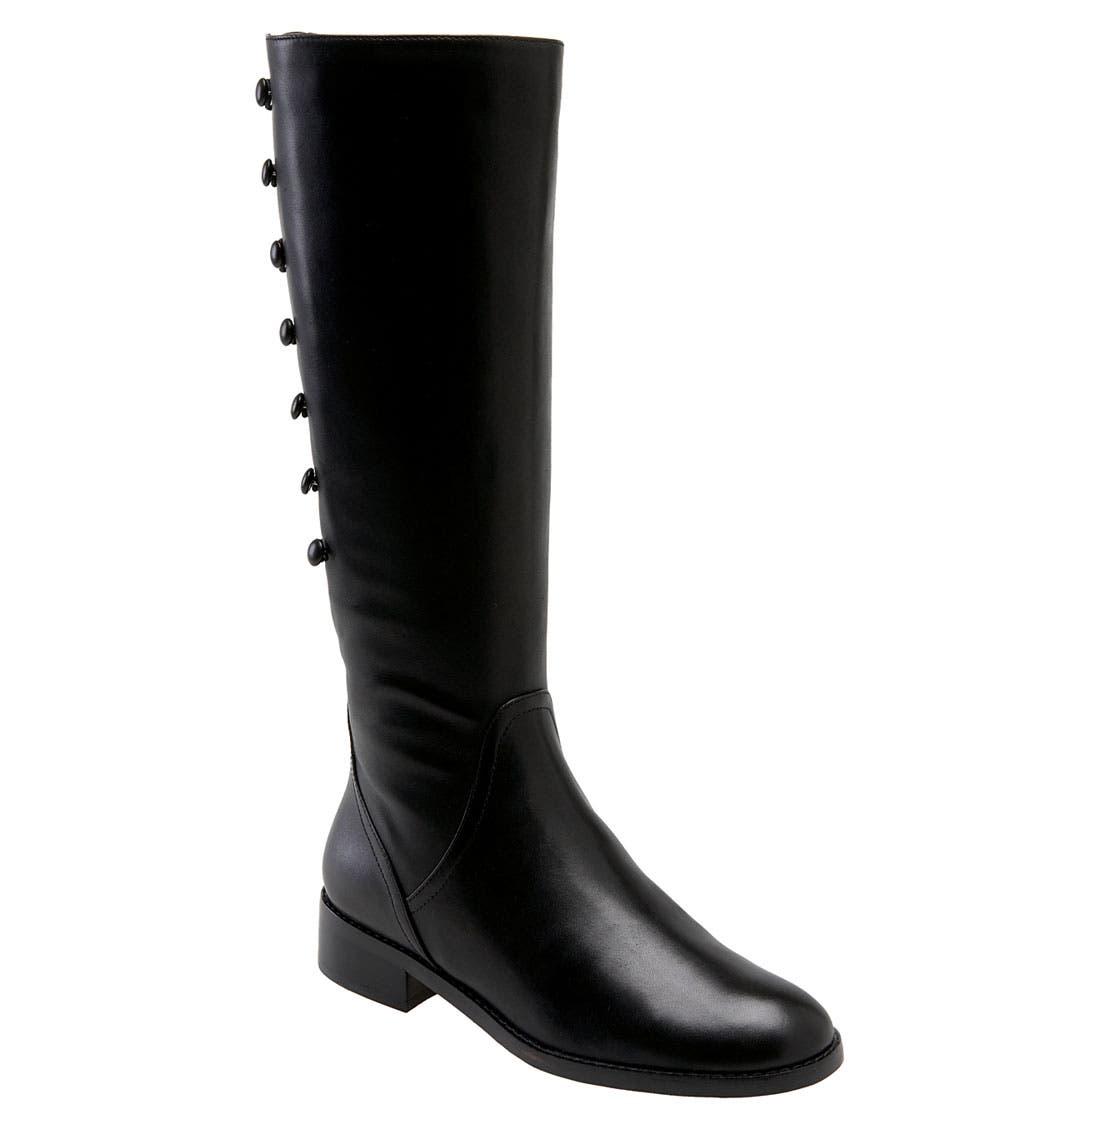 Main Image - Sanzia 'Vintage' Flat Boot